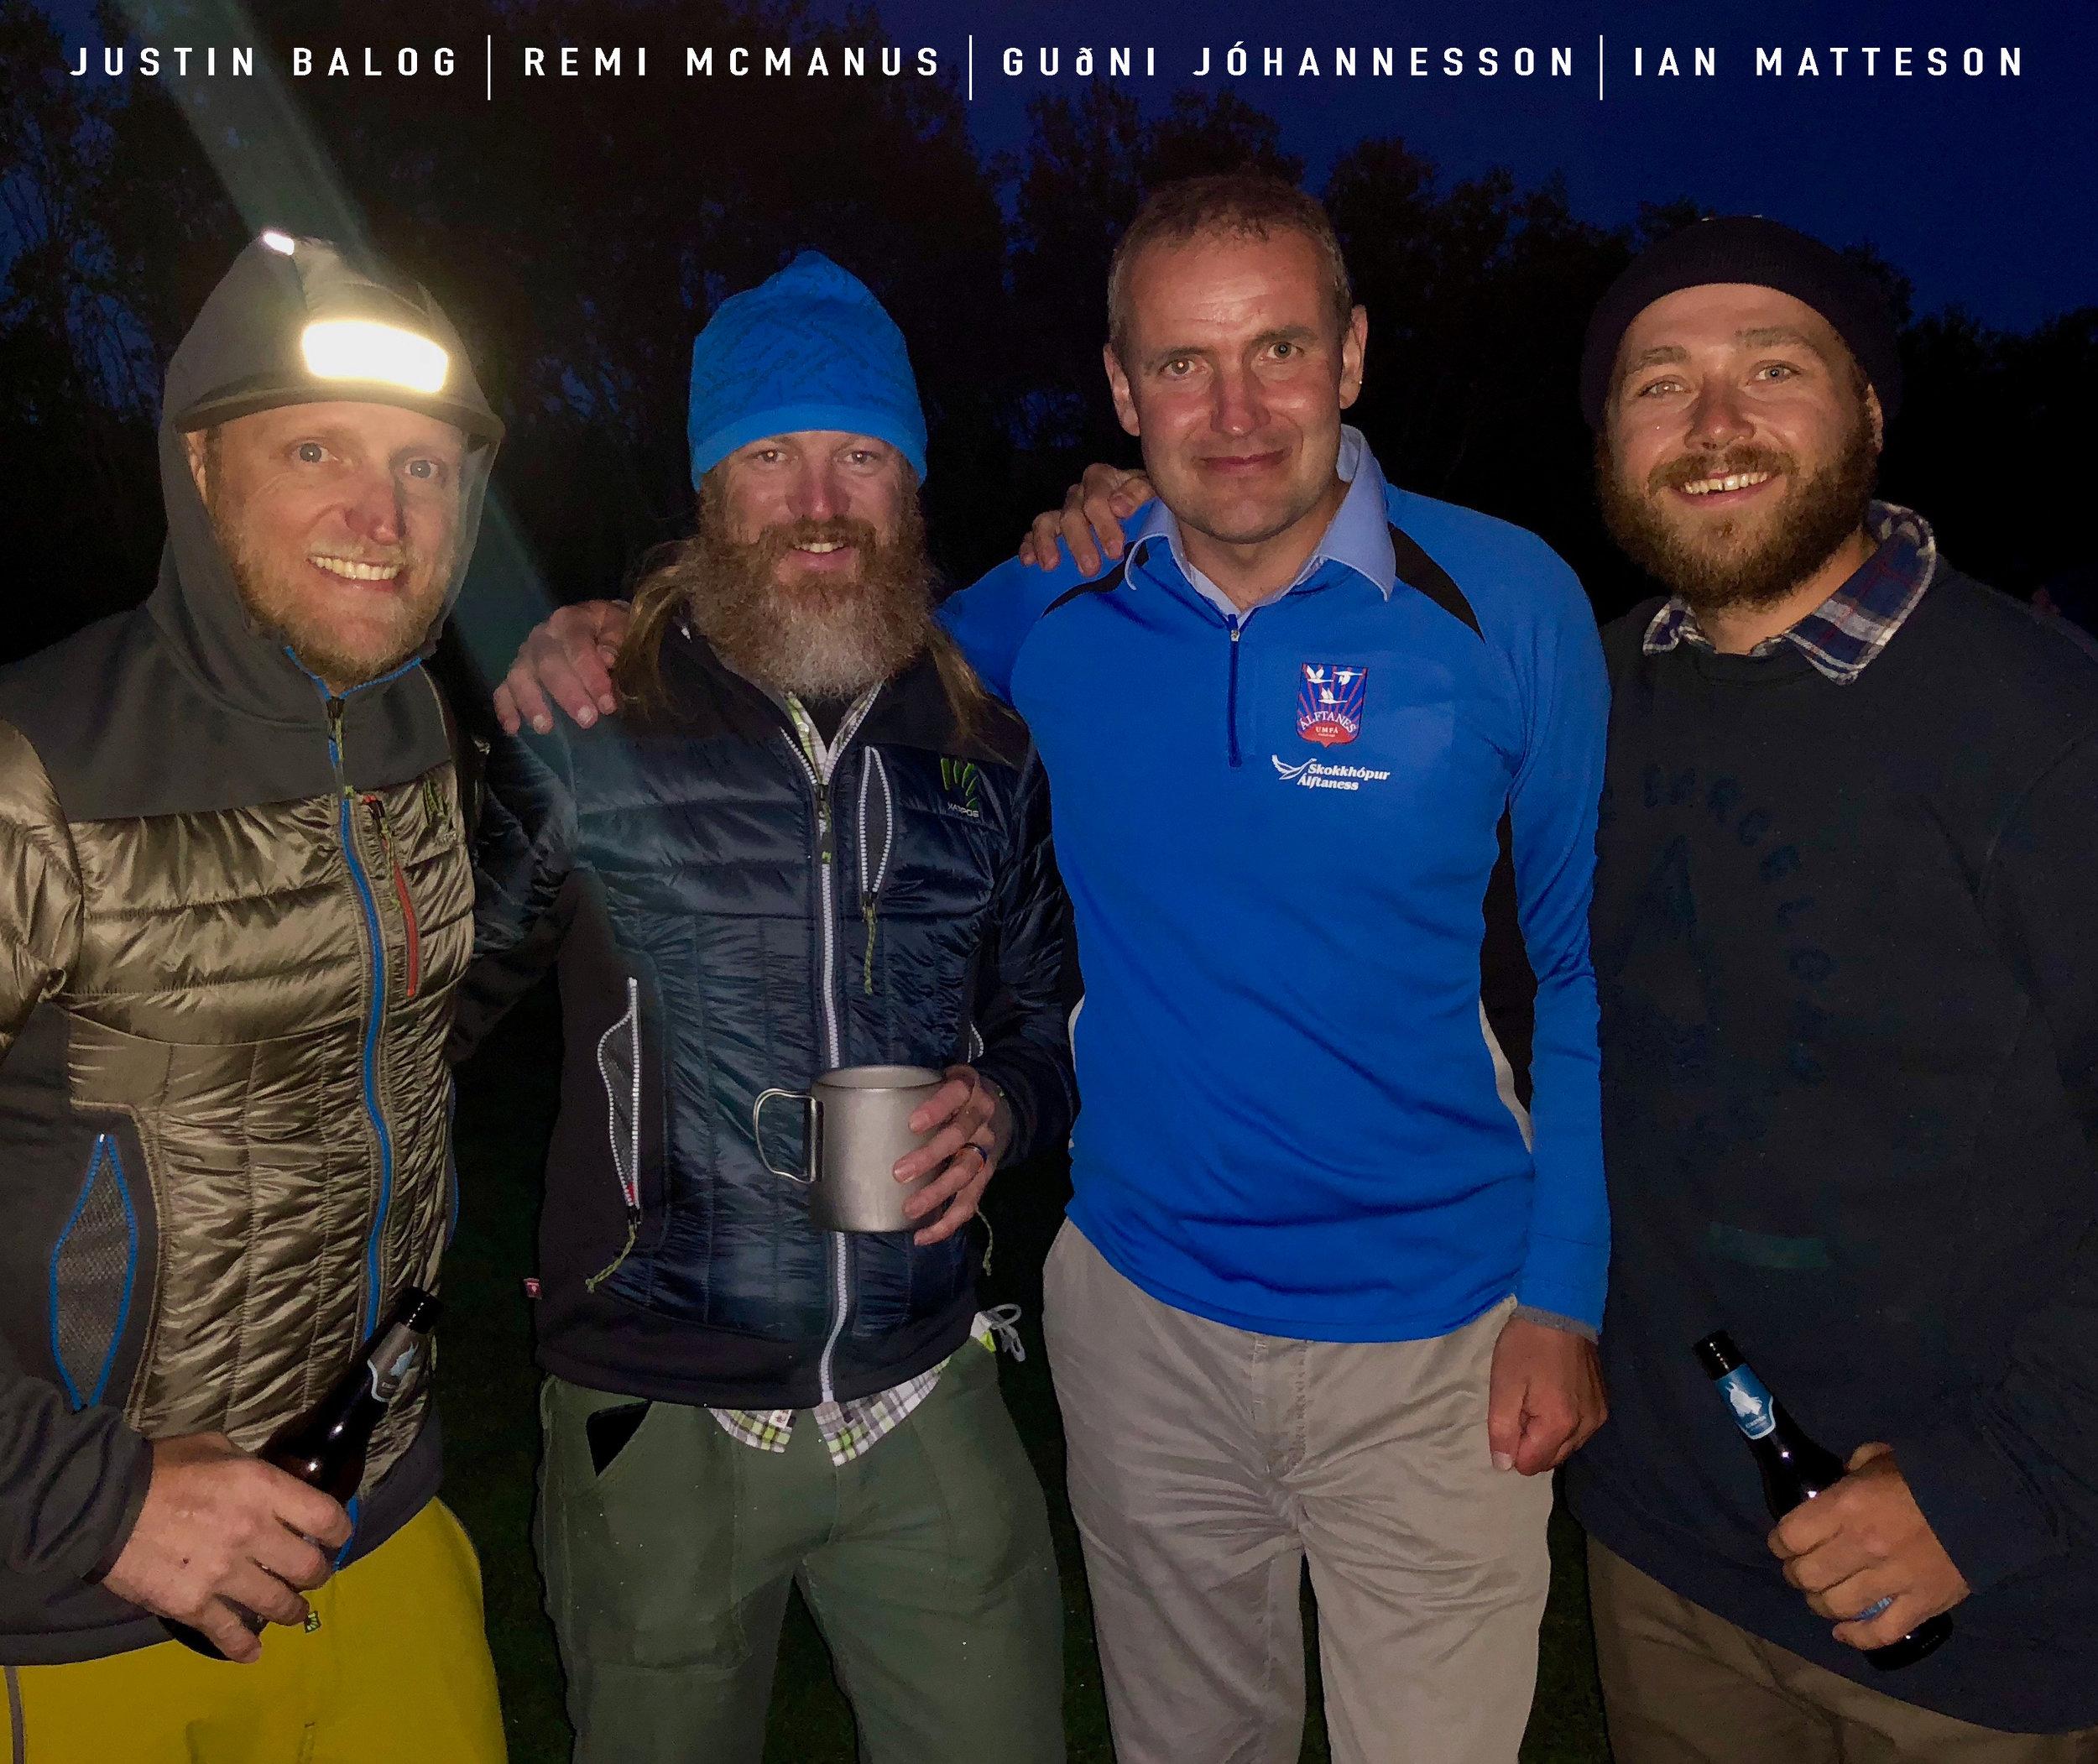 LEFT TO RIGHT: Justin Balog, Remi McManus, Guðni Th. Jóhannesson, Ian Matteson